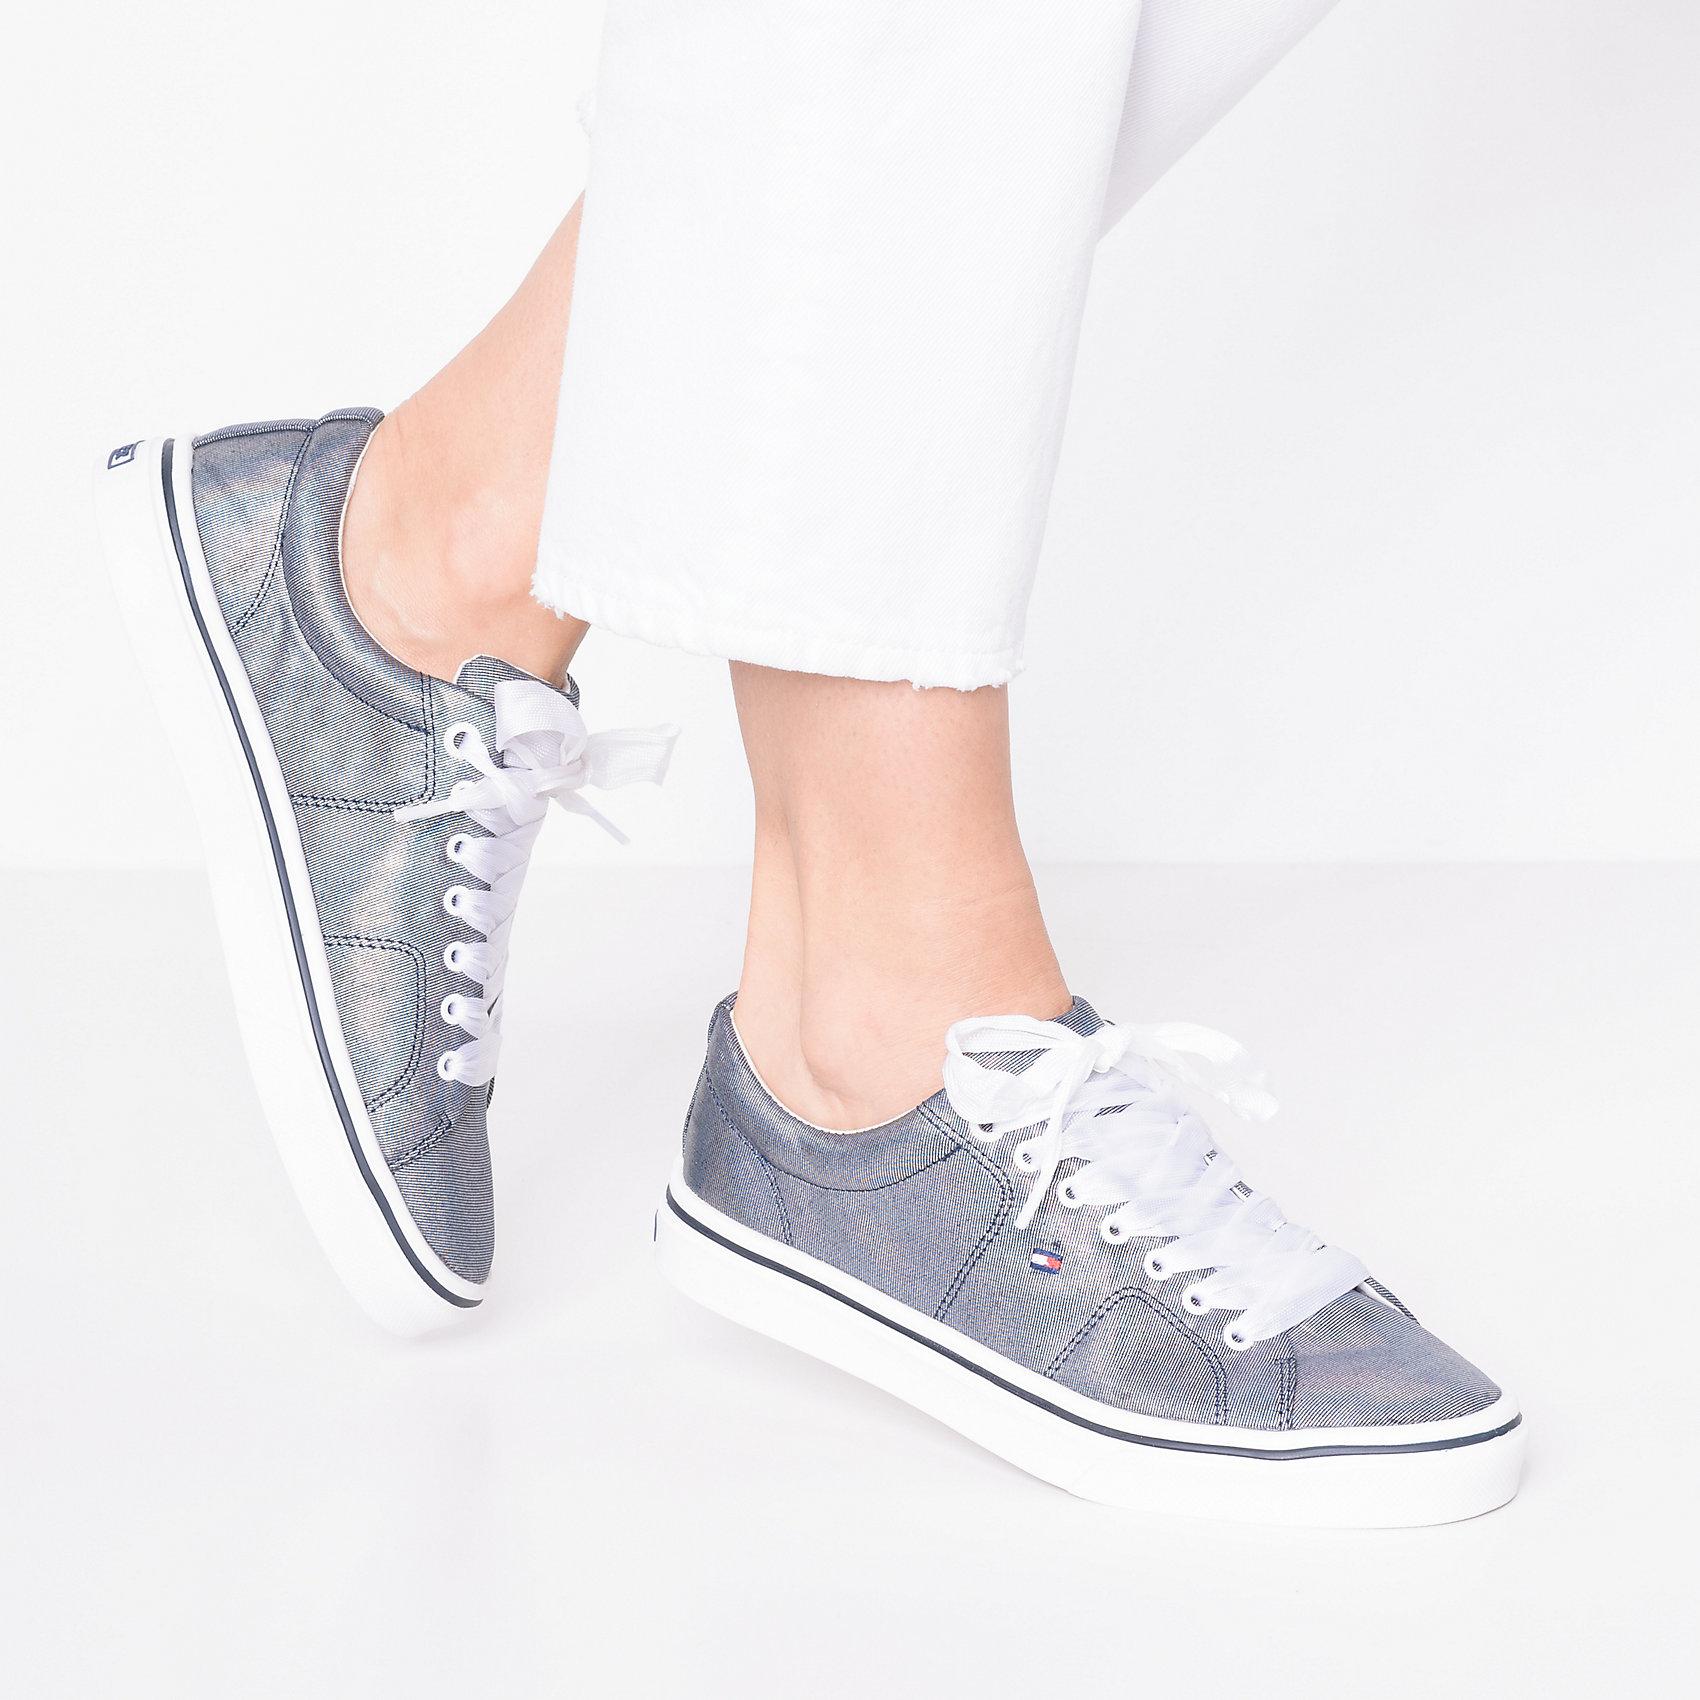 Neu TOMMY HILFIGER METALLIC LIGHT WEIGHT LACE UP Sneakers Low 8005106 für Damen